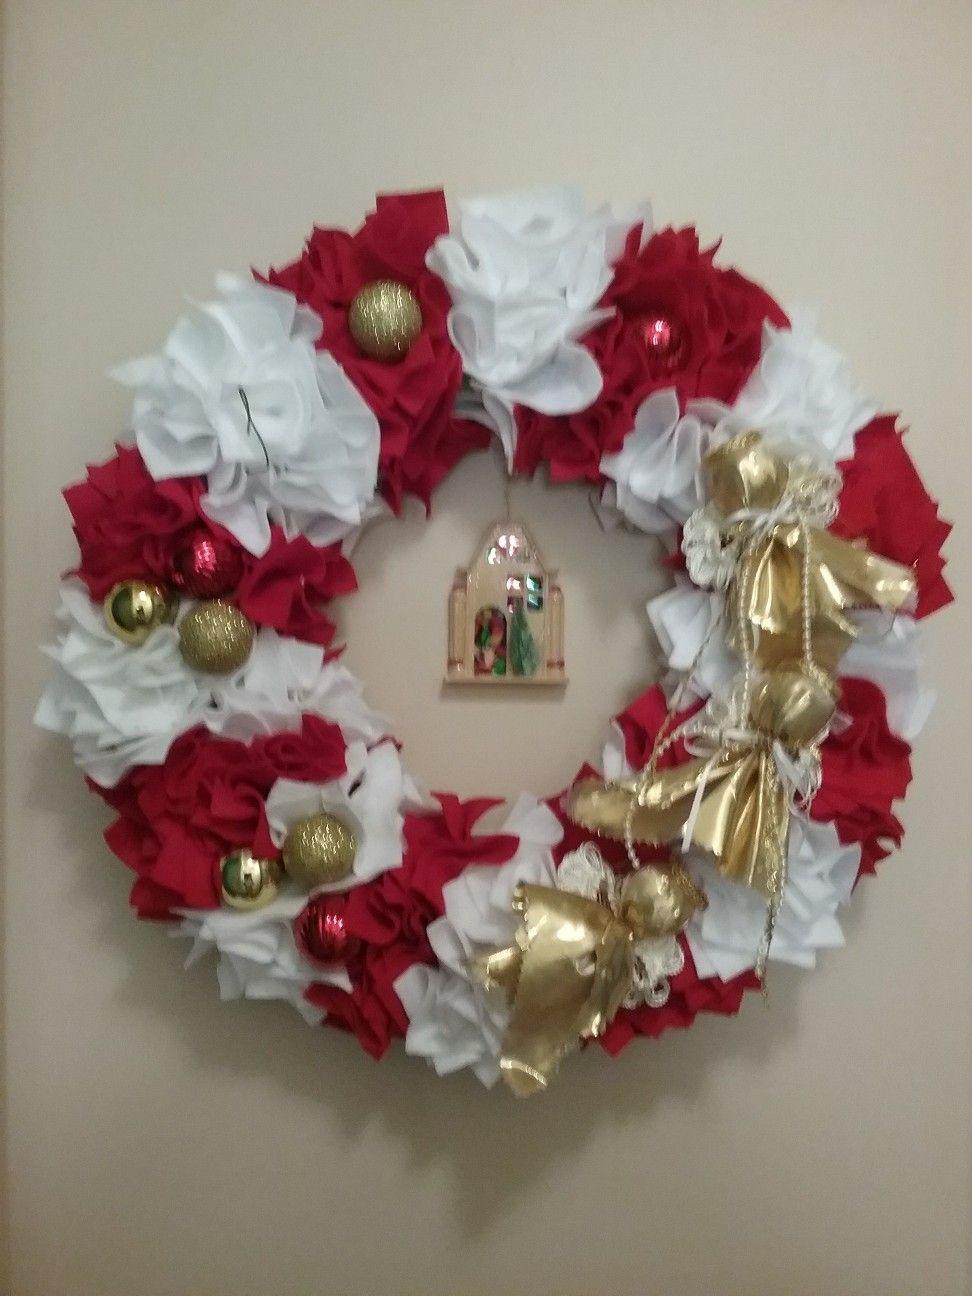 Felt wreath on Styrofoam. Wreaths, Ornament wreath, Felt